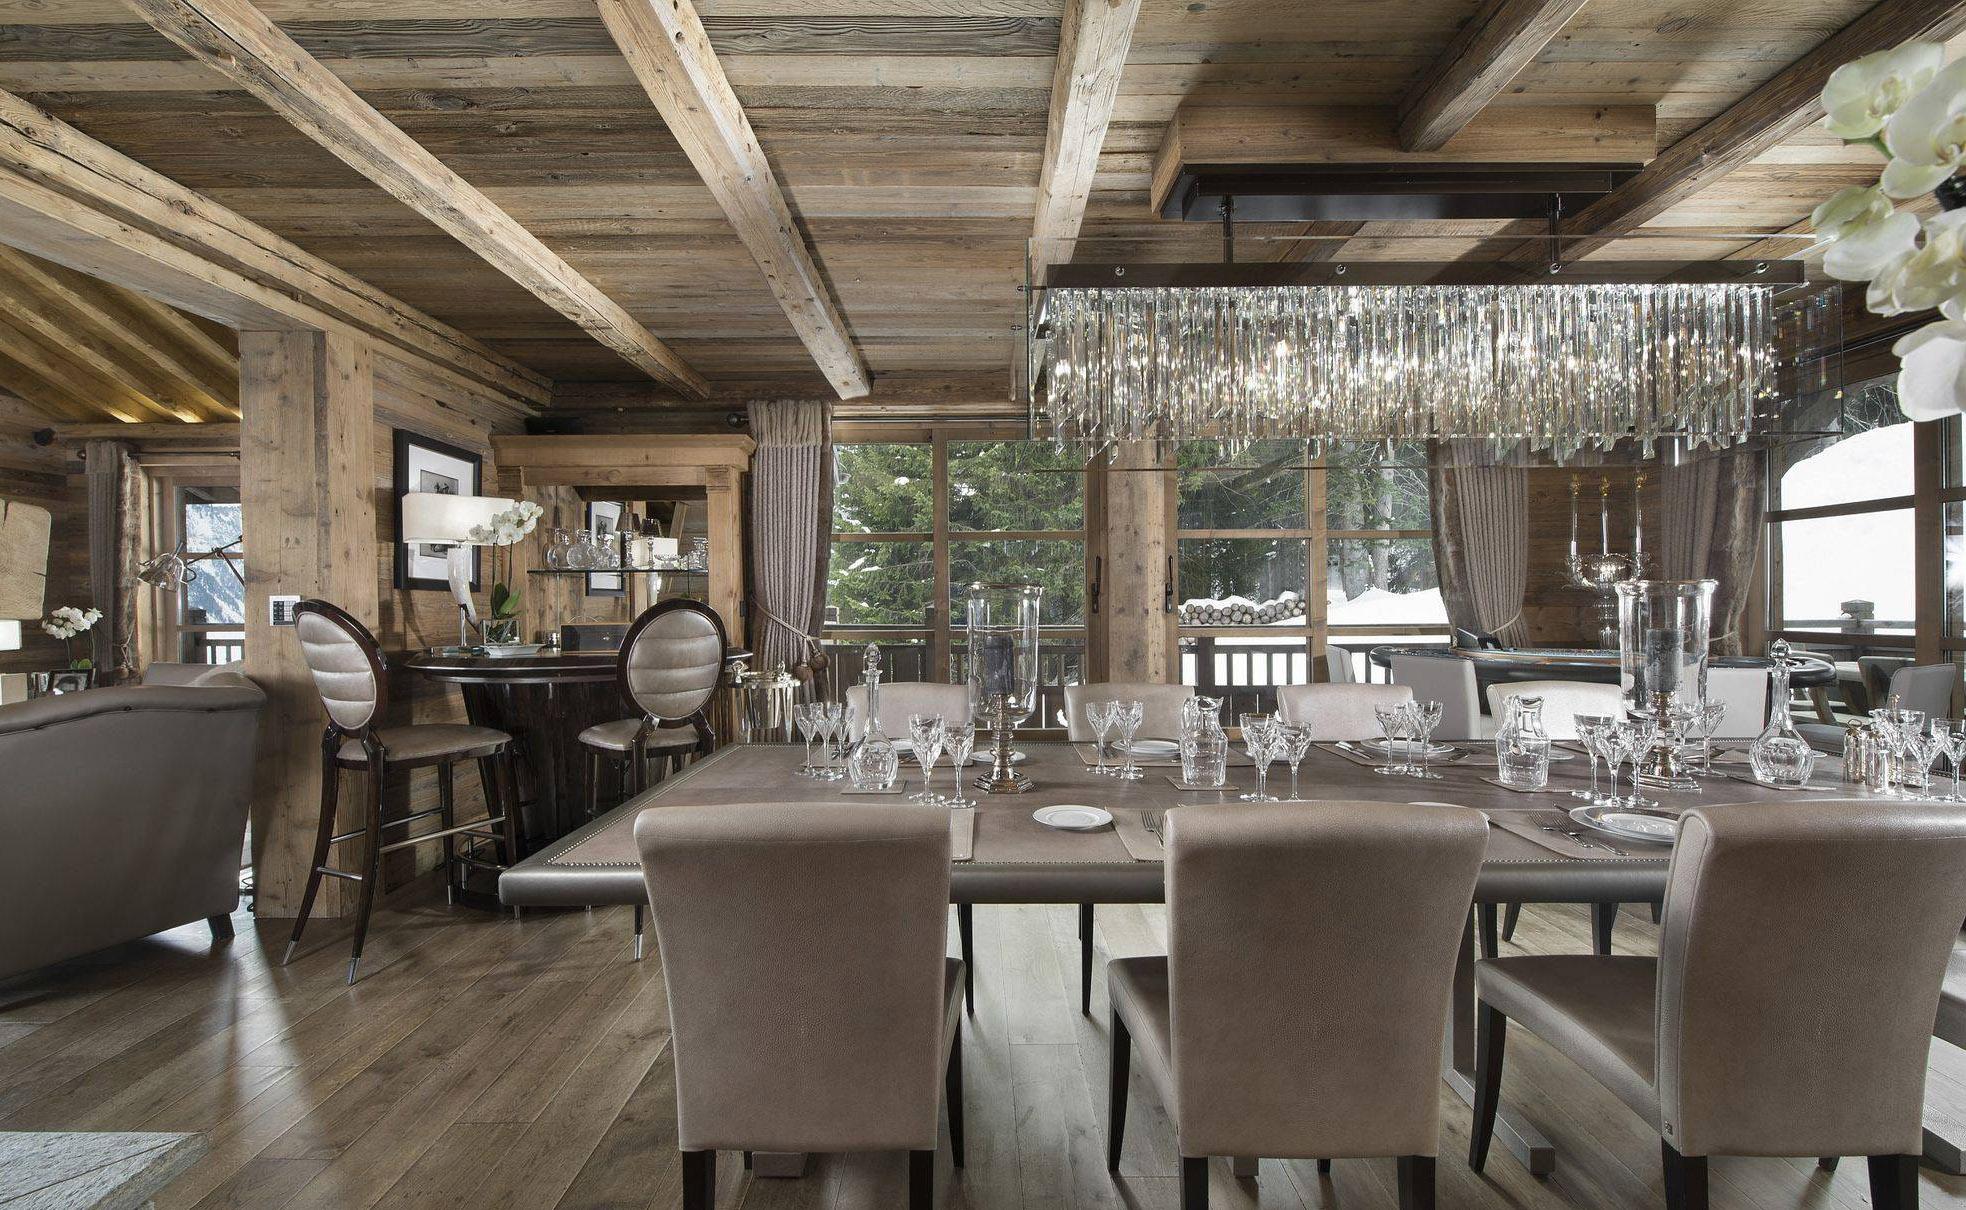 Lovelydays luxury service apartment rental - Courchevel - Great Roc Chalet - Partner - 7 bedrooms - 6 bathrooms - Dining living room - 809cde5c7bb1 - Lovelydays